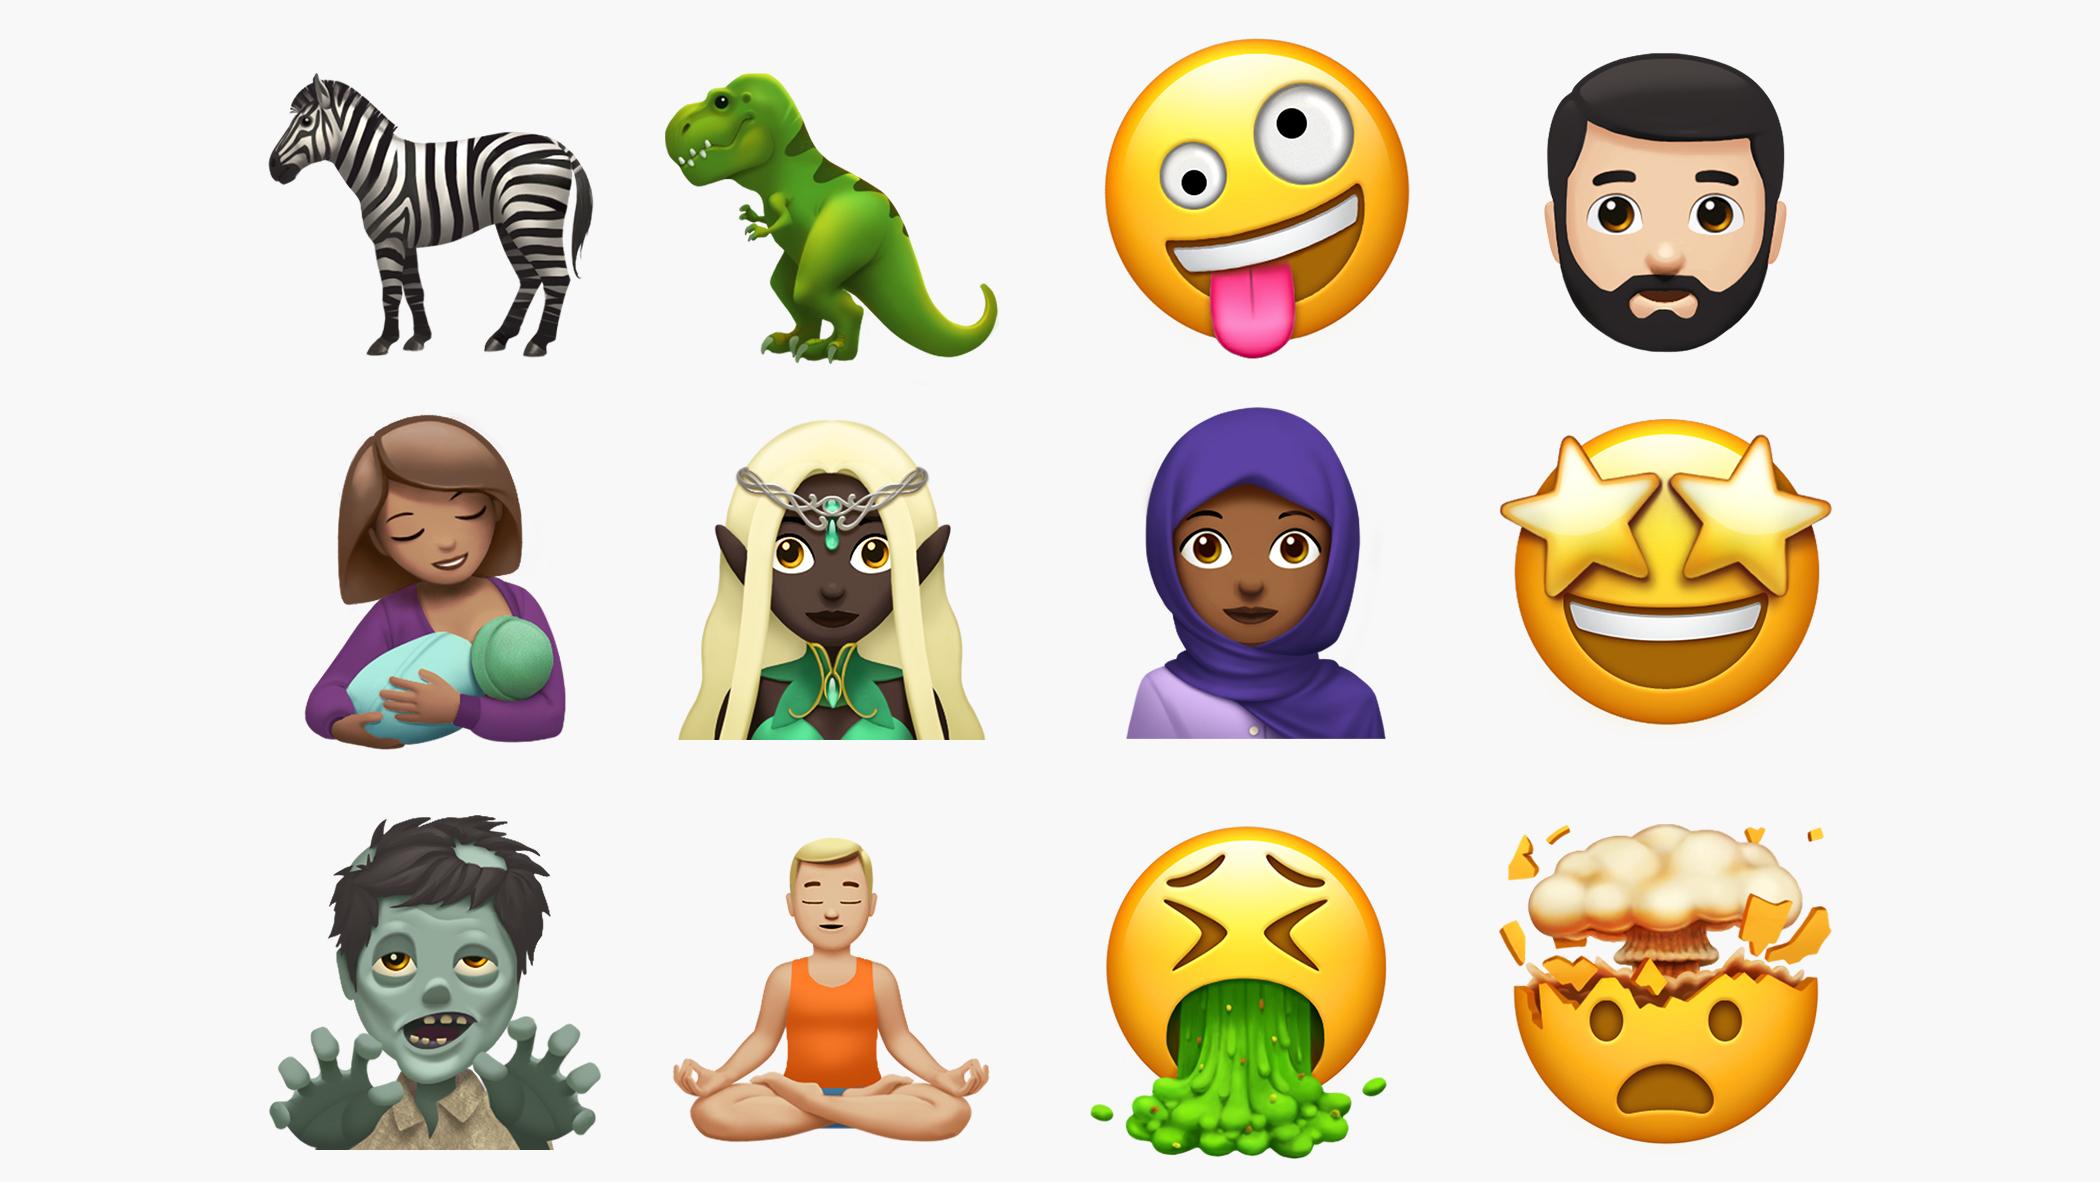 ios-11-new-emoji-iphone